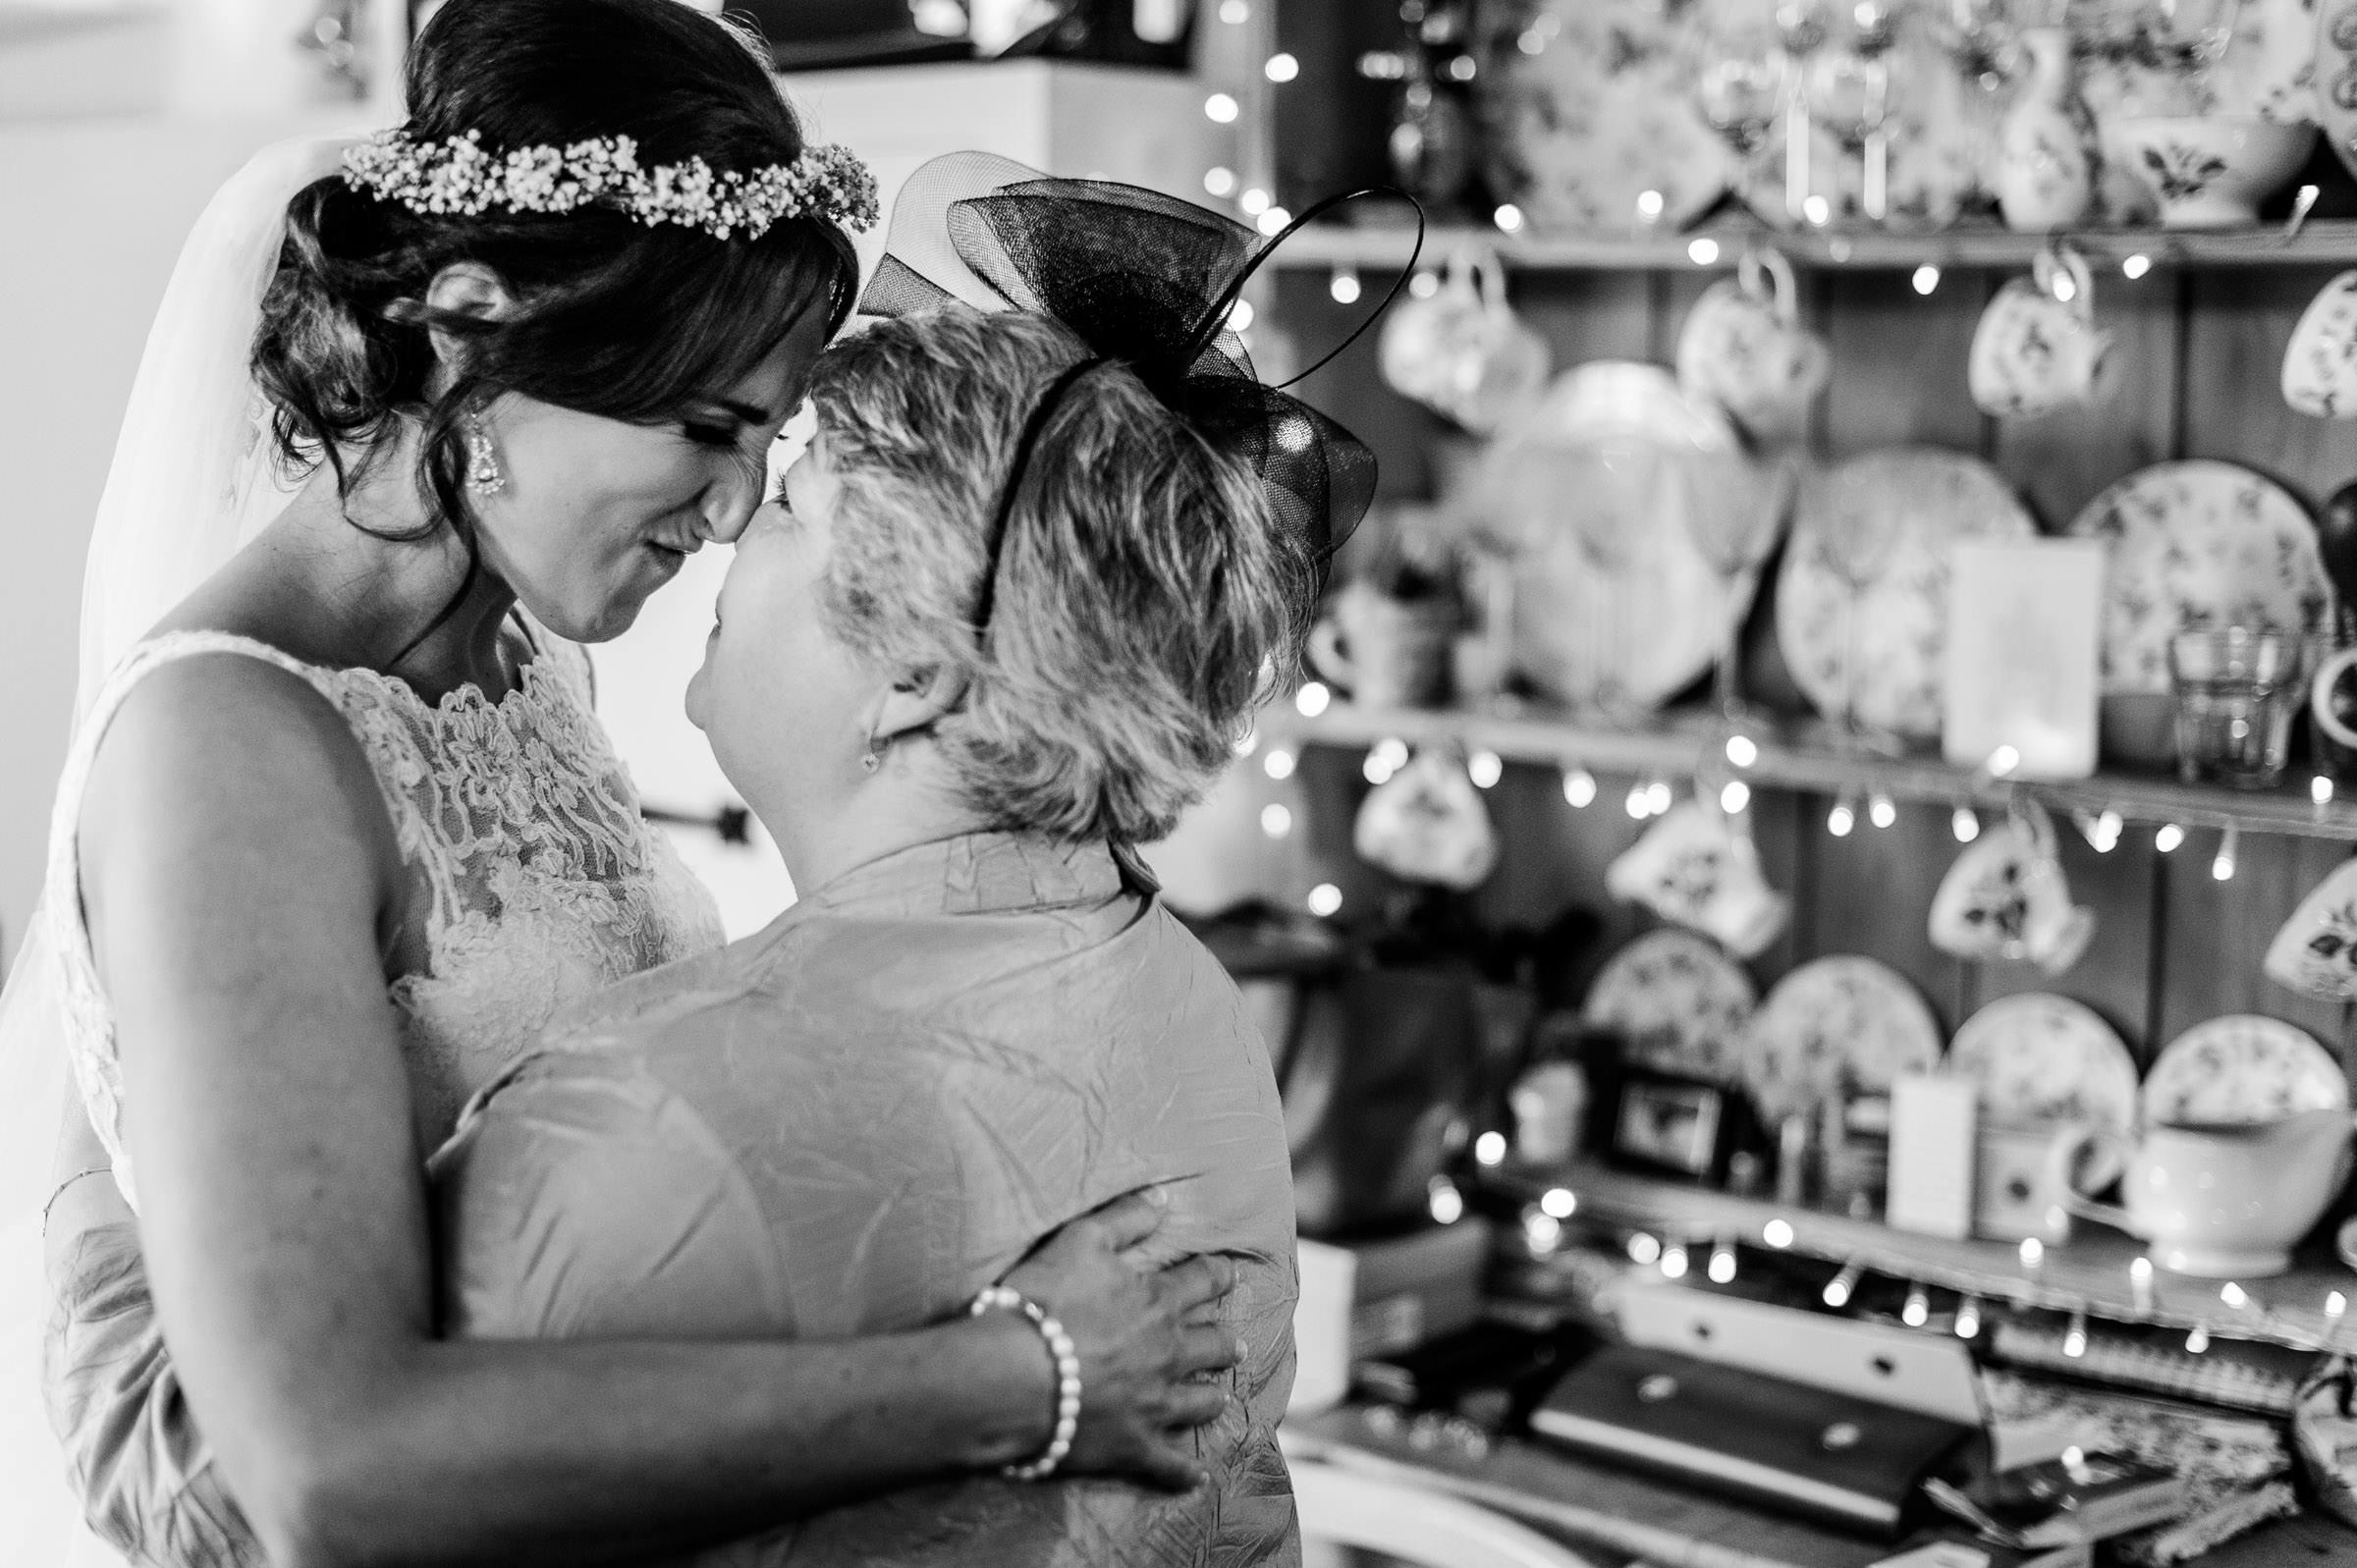 Notley Tythe Barn Reportage Wedding Photos 005.jpg